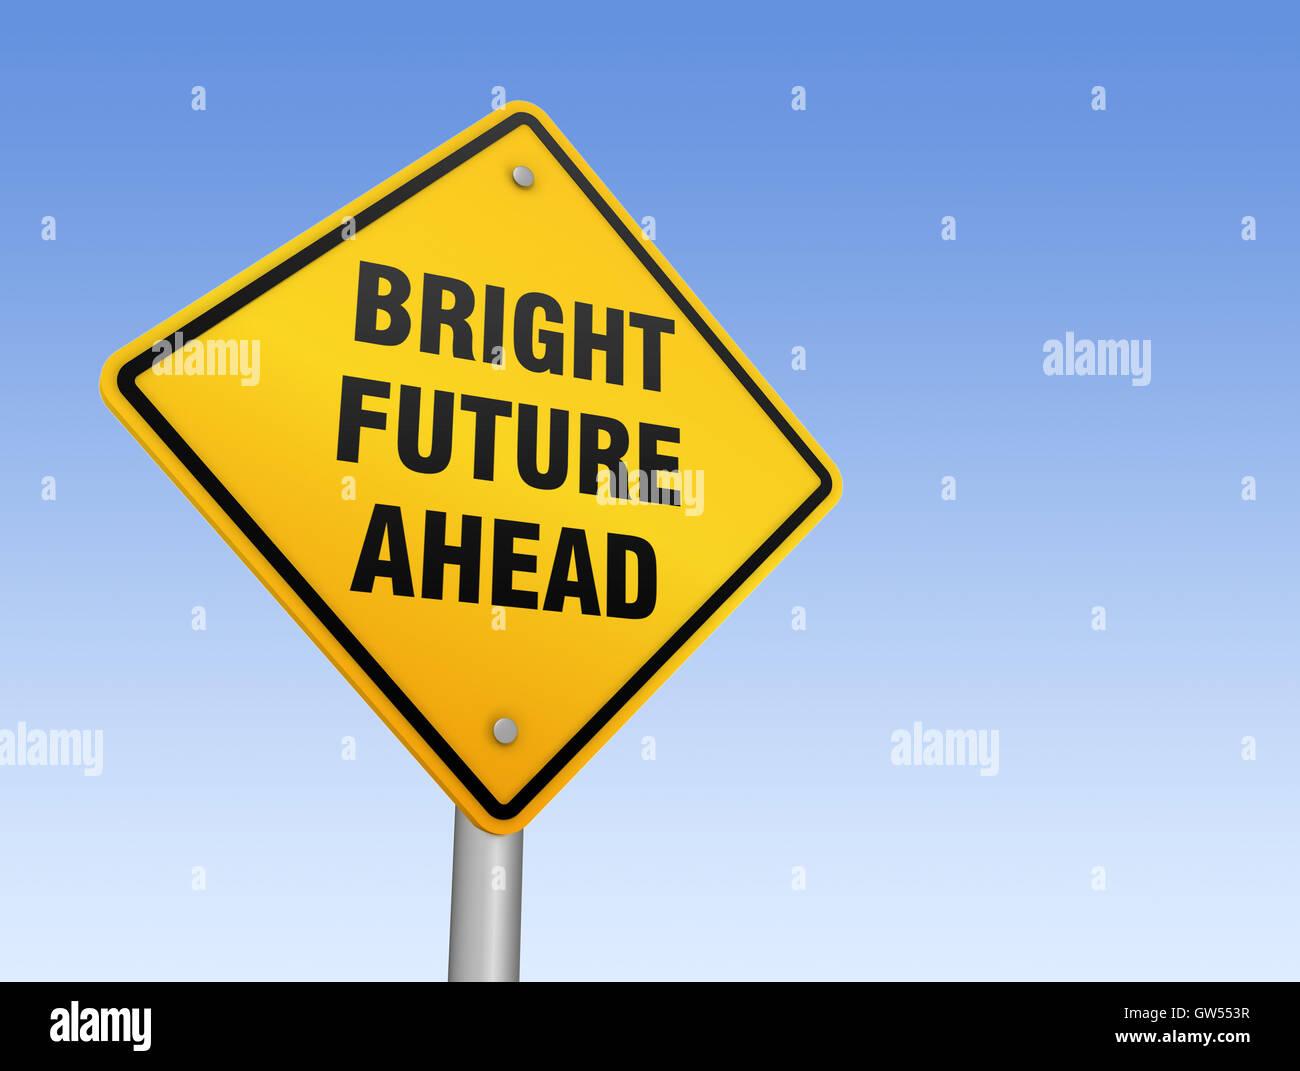 Bright Future Ahead Road Sign 3d Illustration Stock Photo